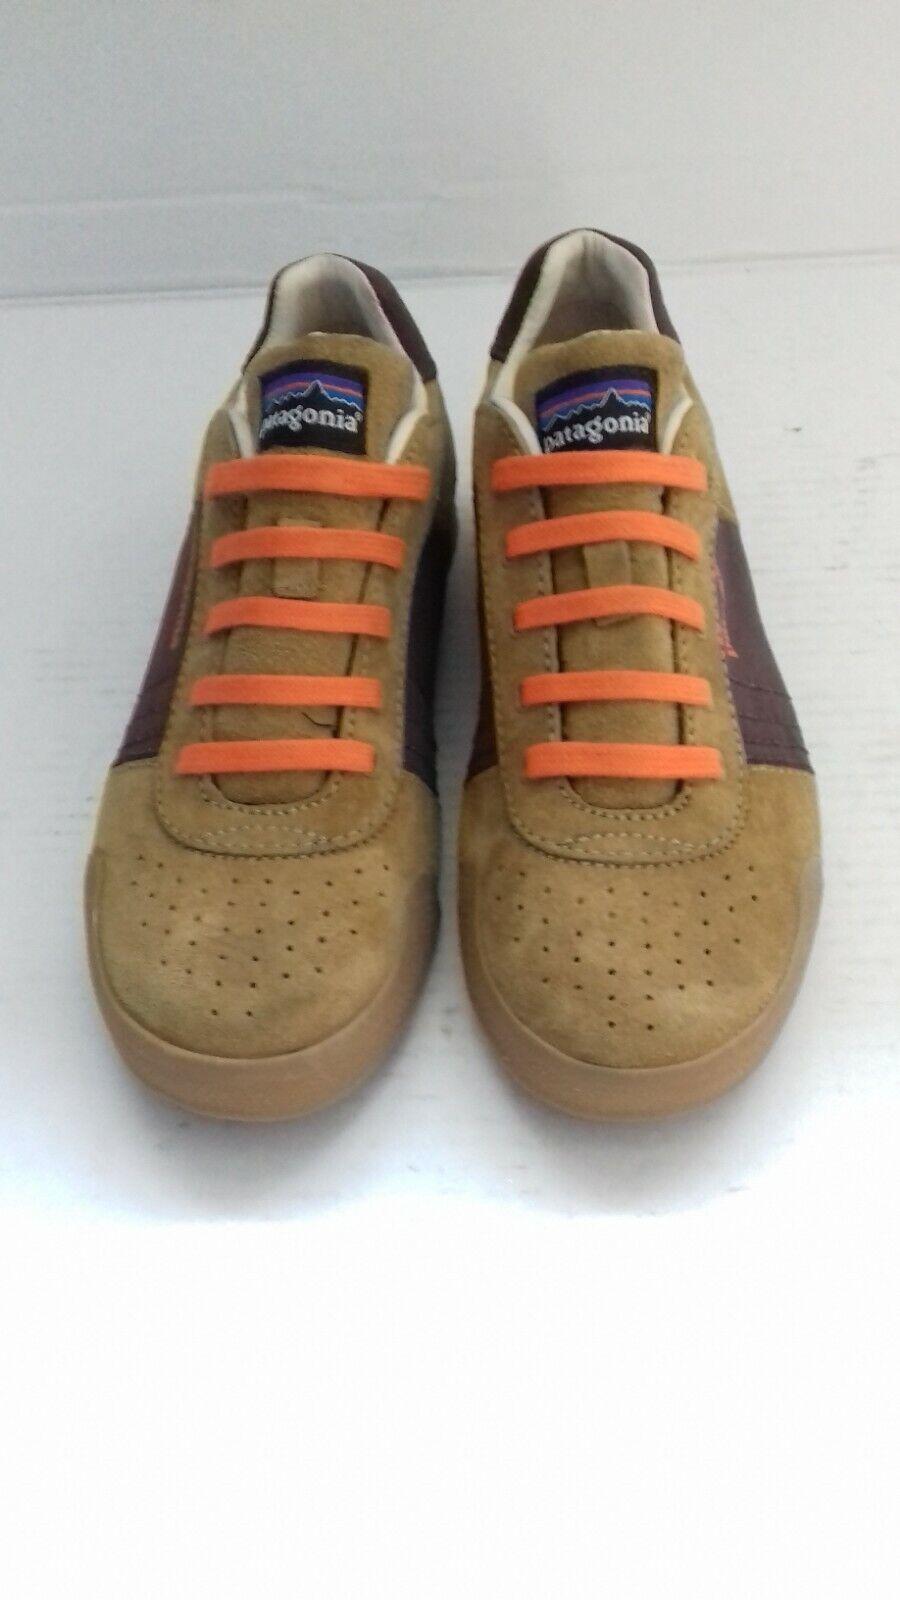 Patagonia Mens shoes QUINTIN dark bamboo Size UK 6.5, Euro 39.5 New